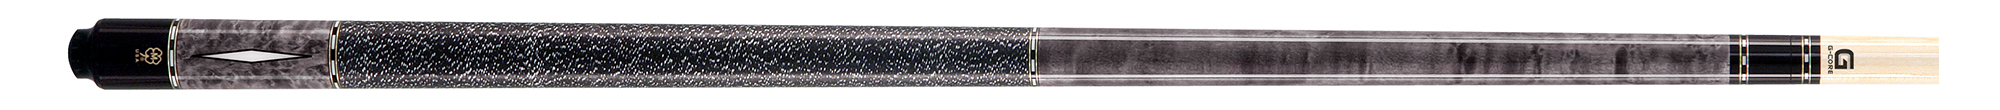 PK3024: McDermott G302 Birdseye Titanium Grey pool Gewicht: 19Oz #1